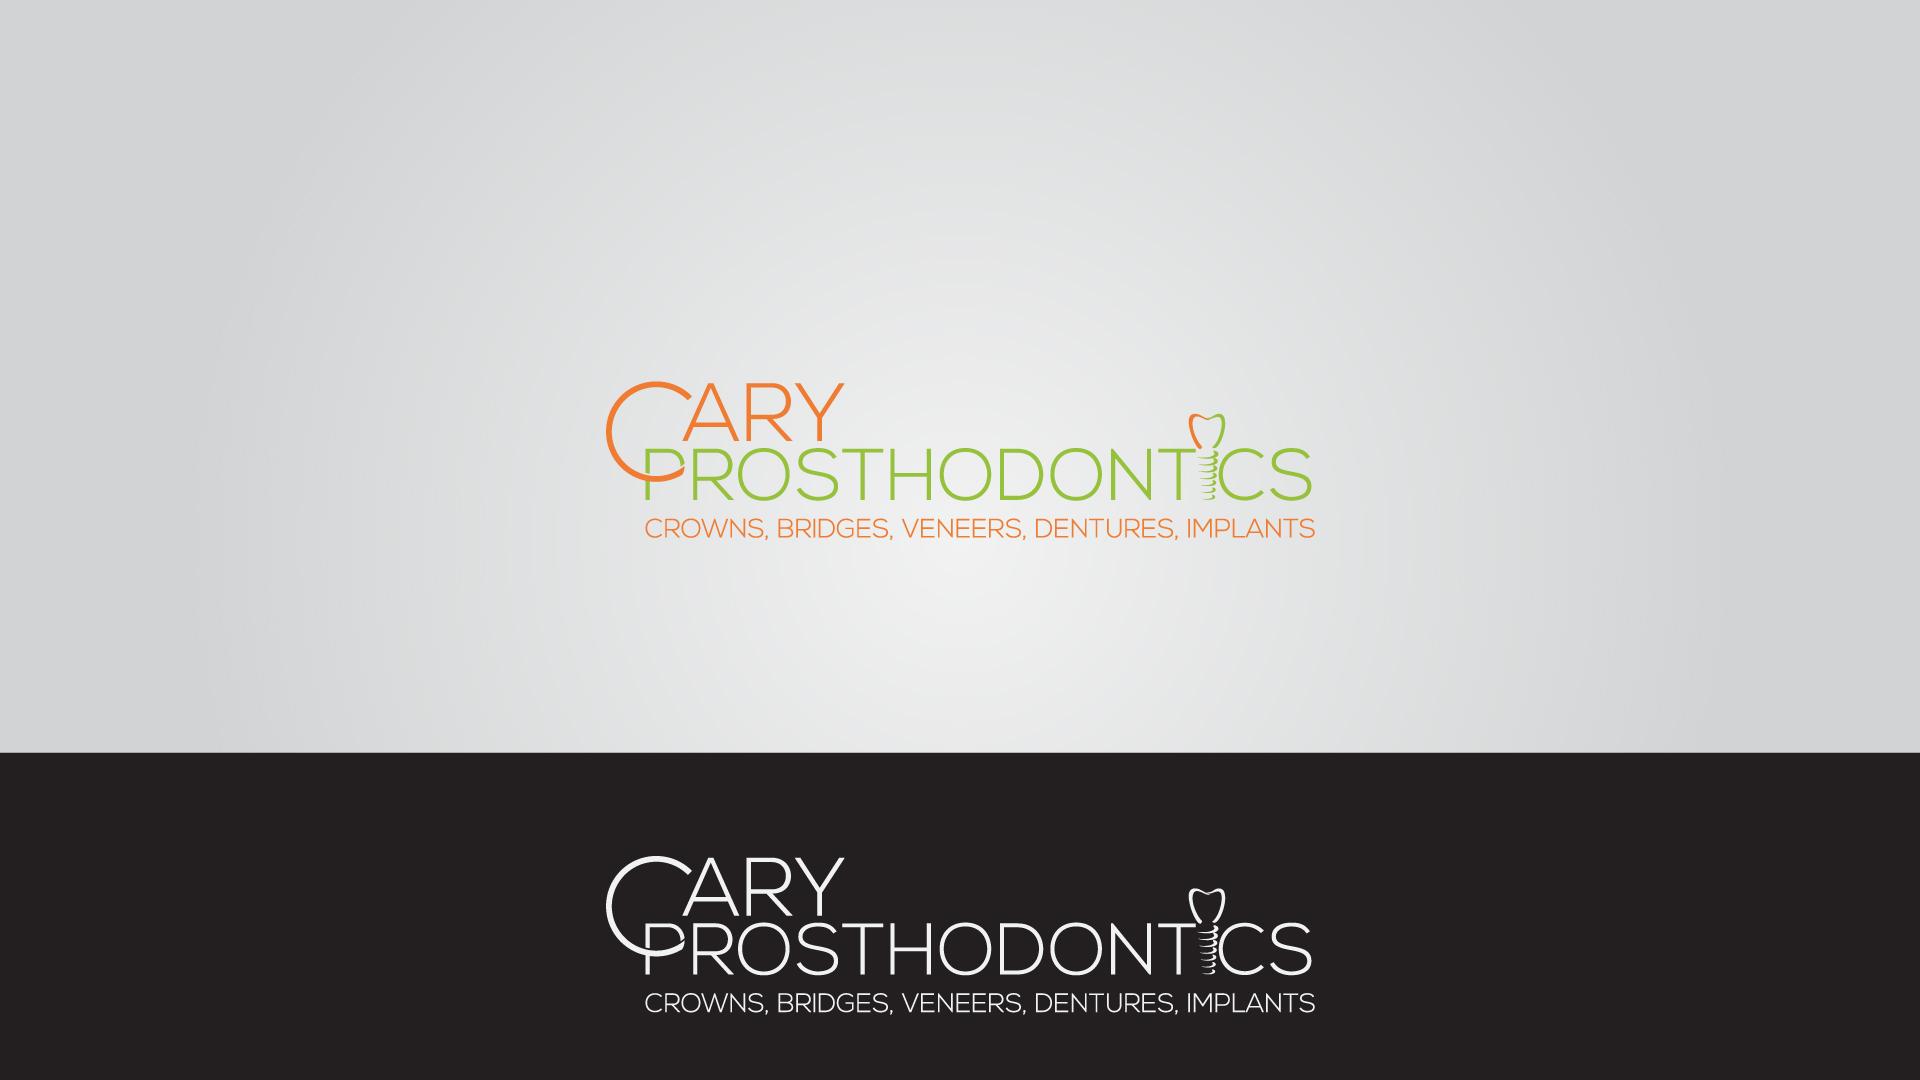 Logo Design by MD SHOHIDUL ISLAM - Entry No. 190 in the Logo Design Contest Cary Prosthodontics Logo Design.